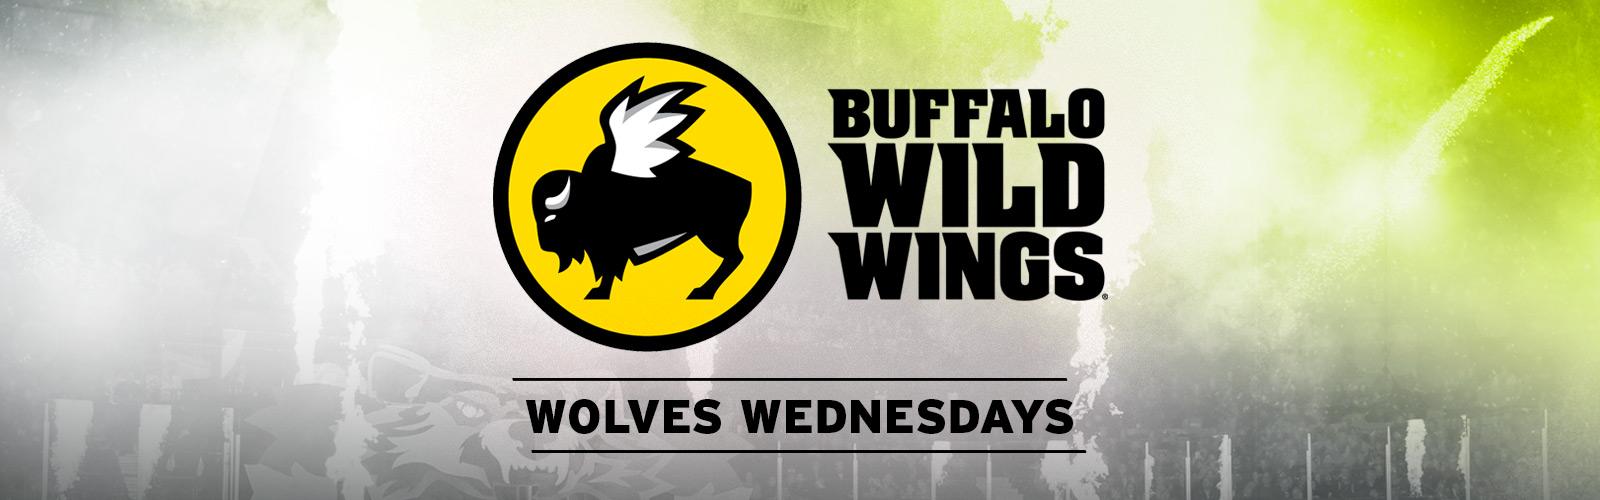 Wolves-Buffalo-Wild-Wings